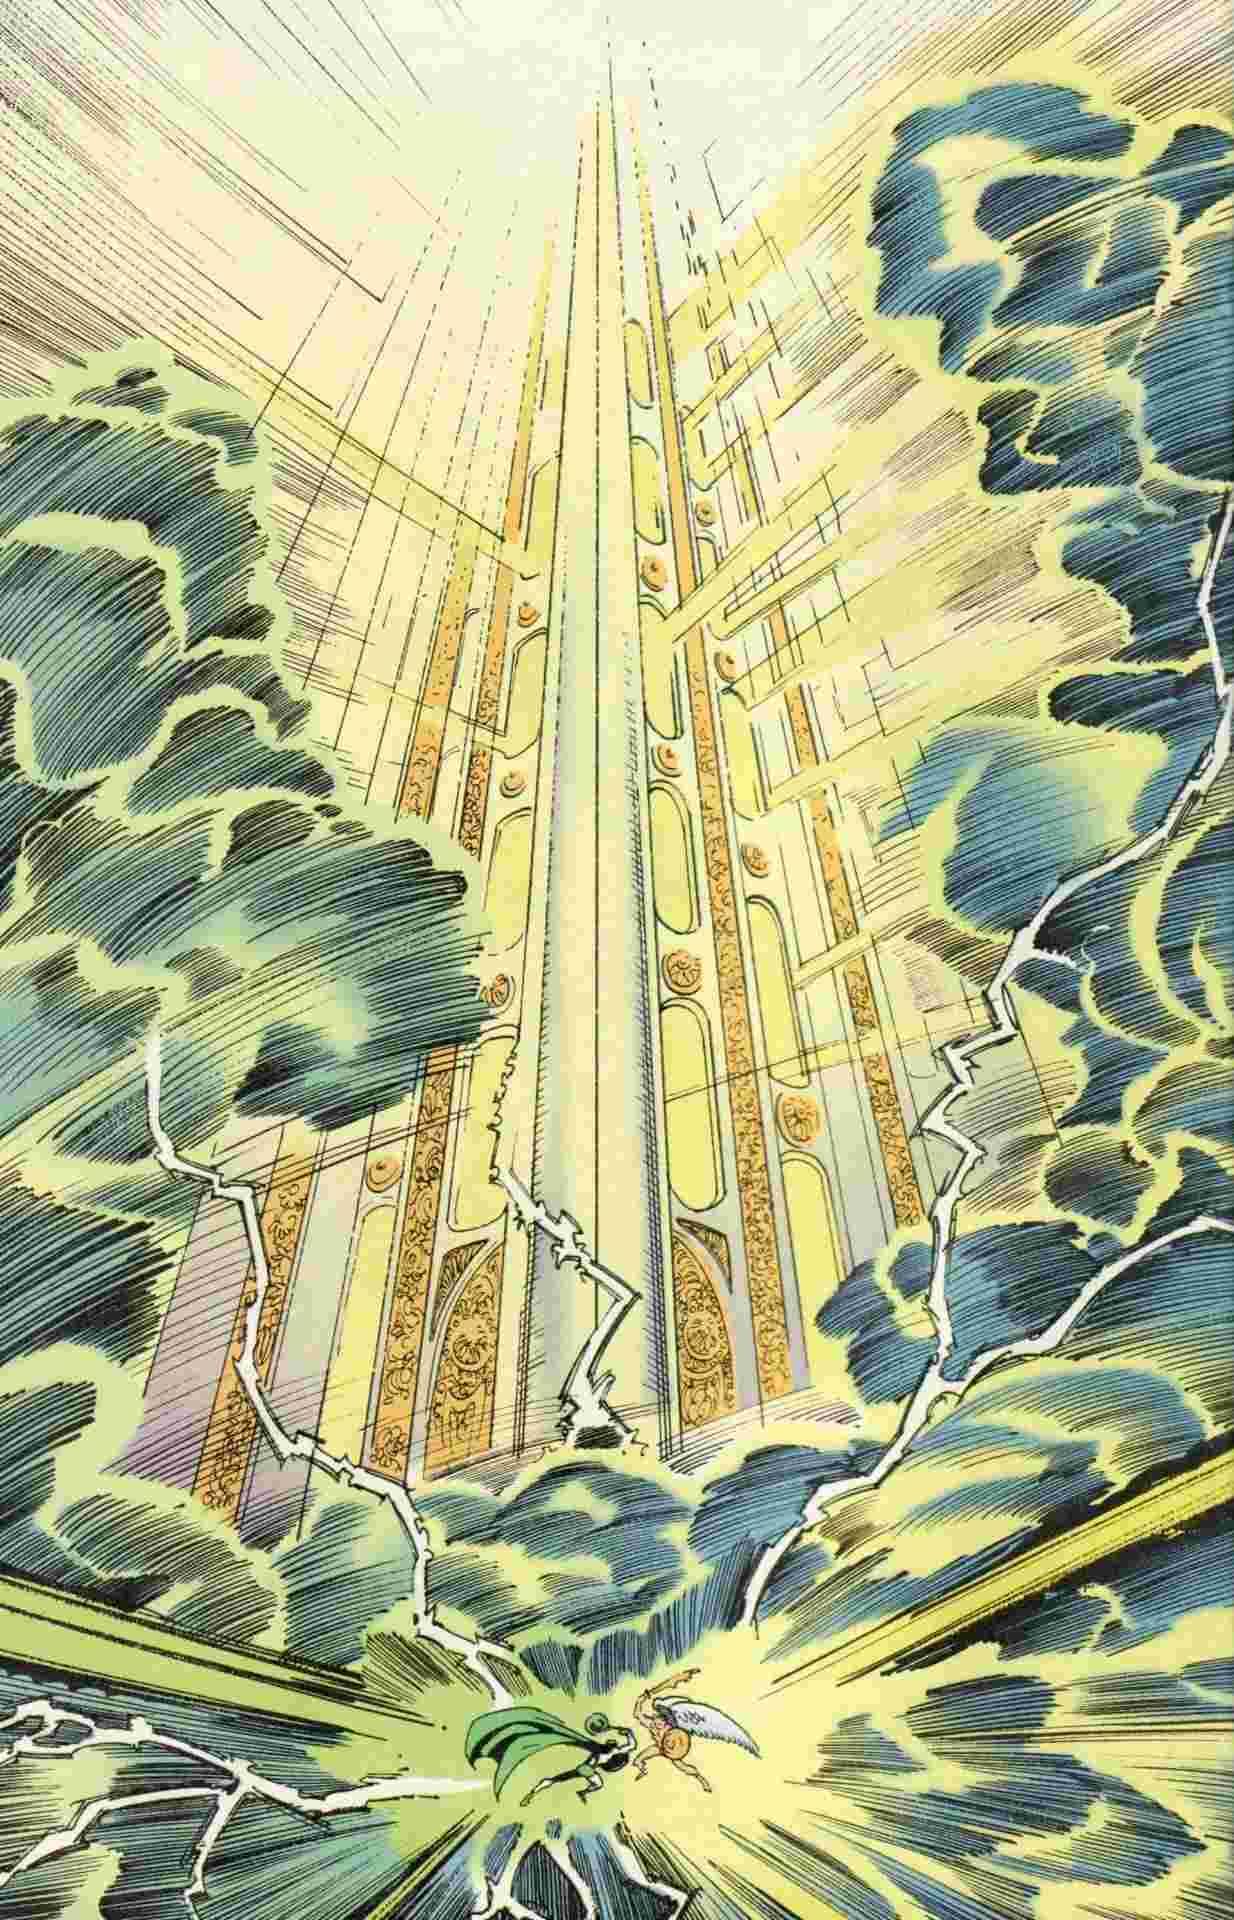 The Presence (DC Comics) and The Presence (Vertigo Comics) 12471515